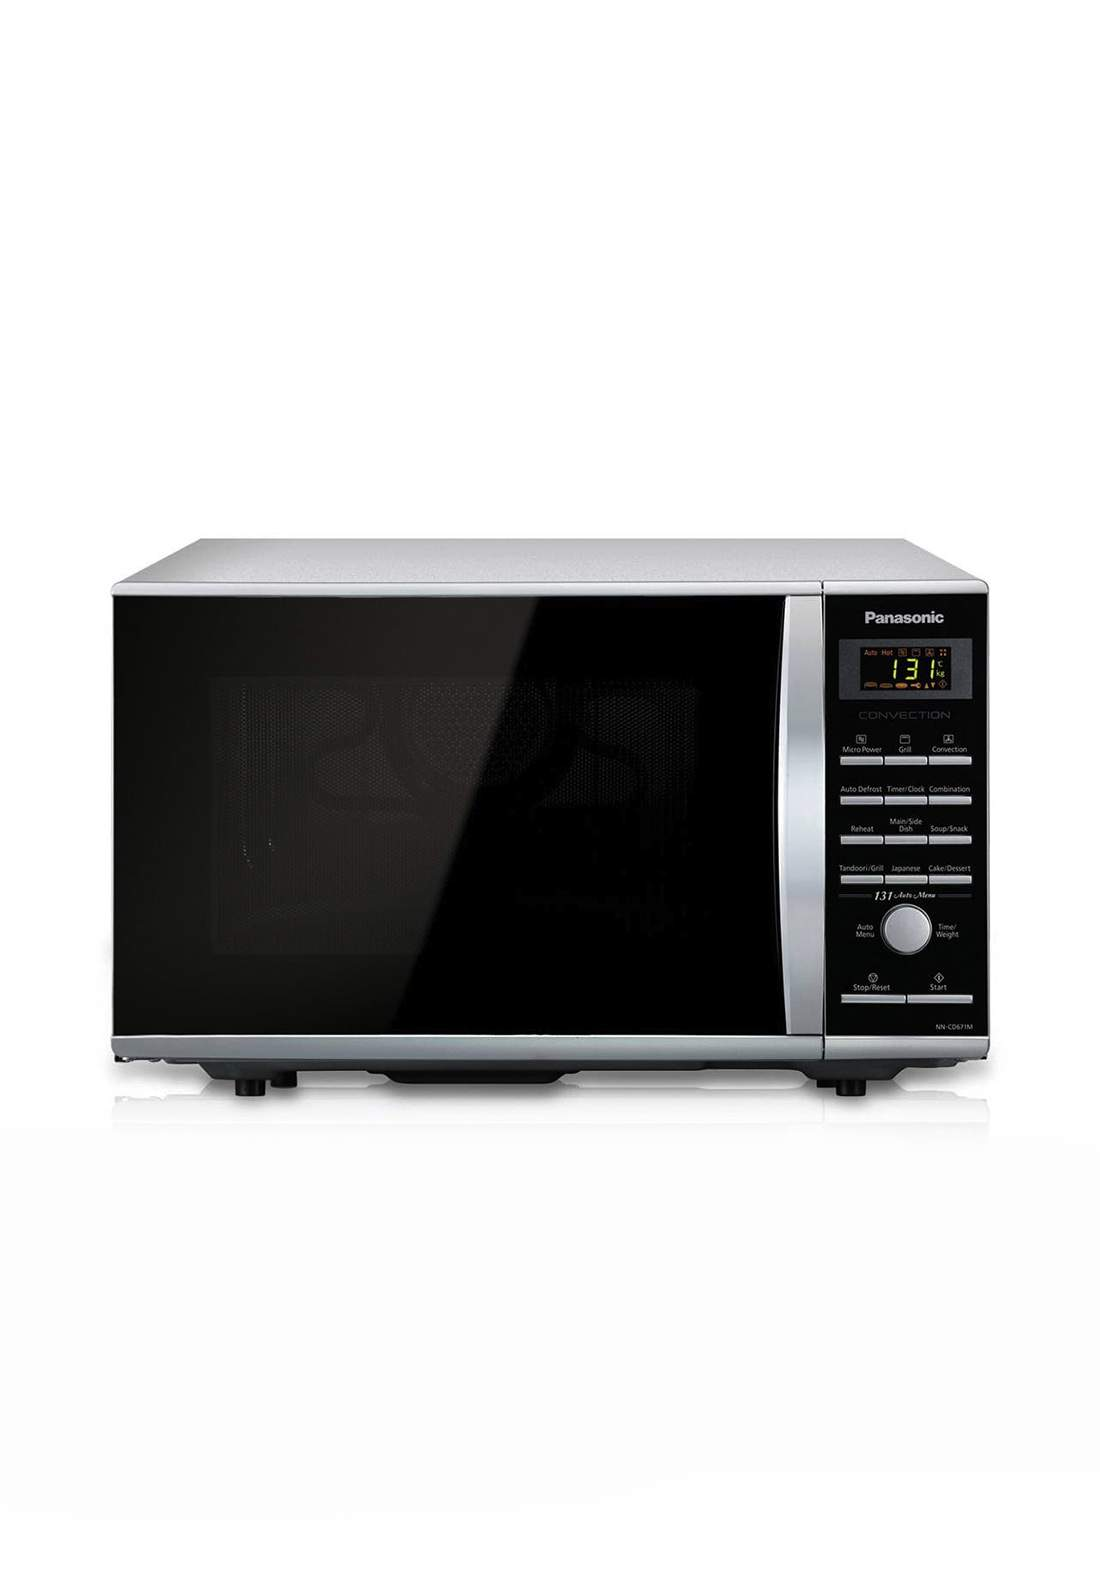 Panasonic-NNCD671MKTQ Convection Microwave Oven 27L مايكرويف